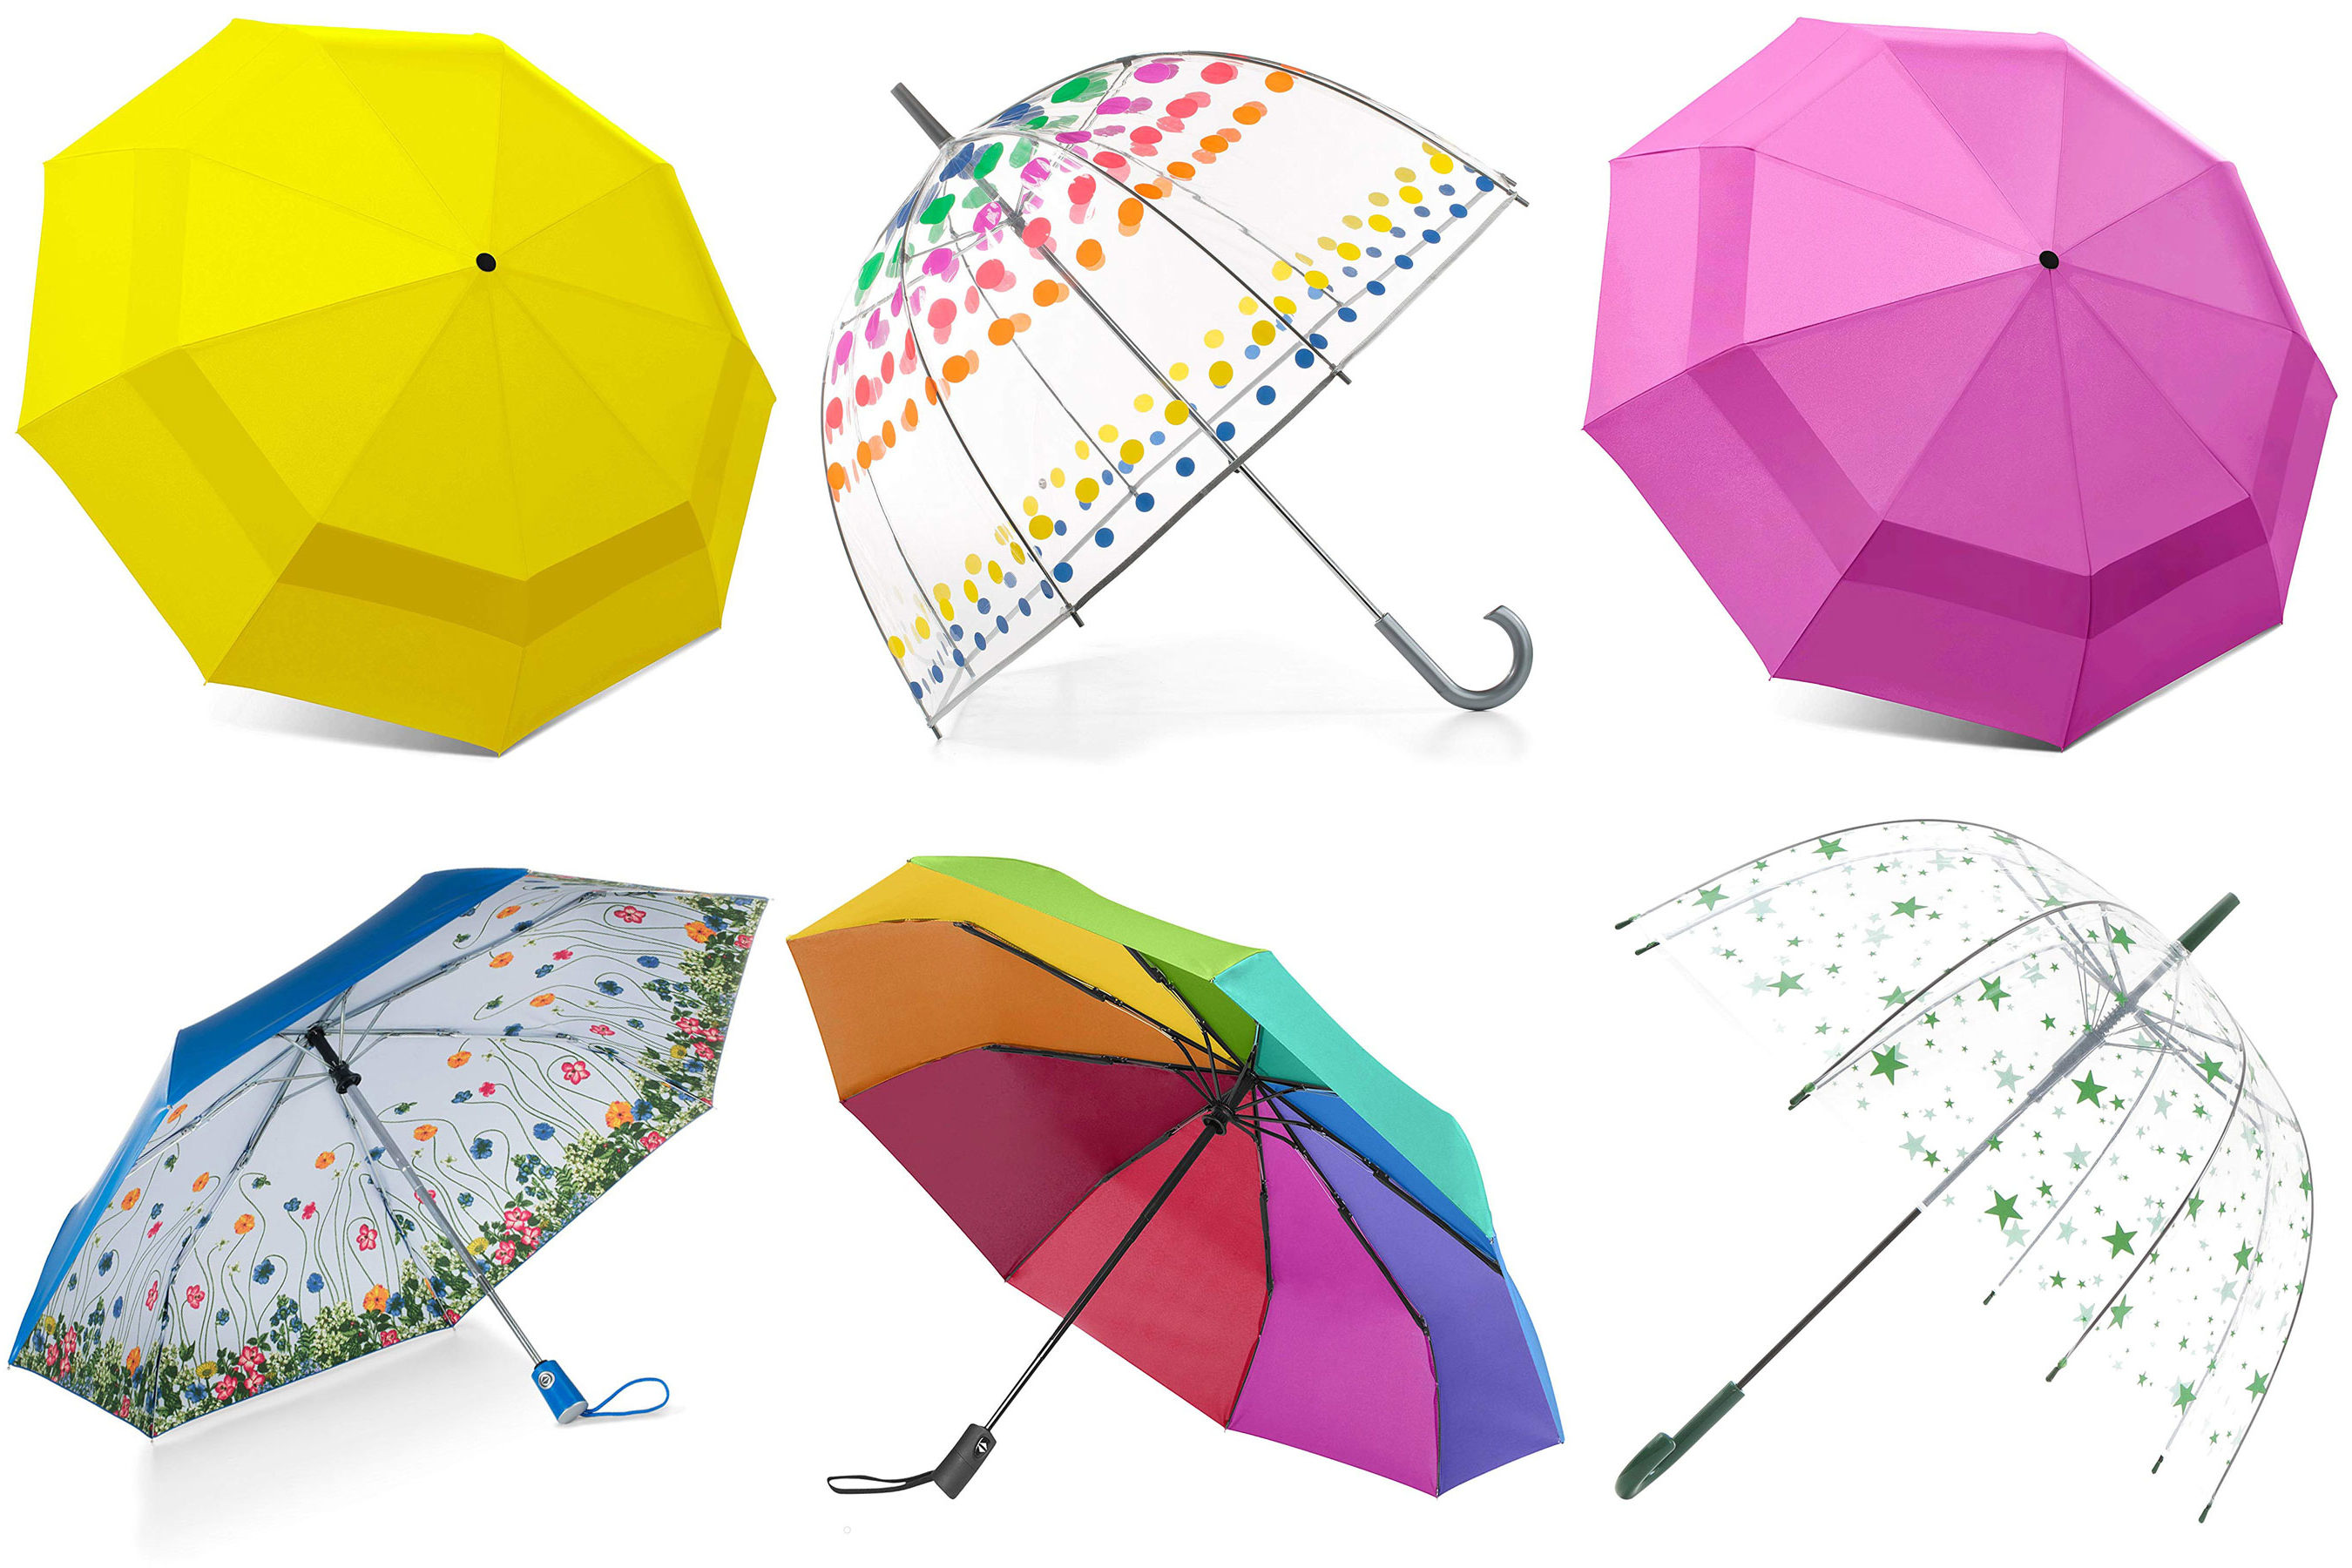 People With Regard To Dore Patio Cantilever Umbrellas (View 16 of 20)